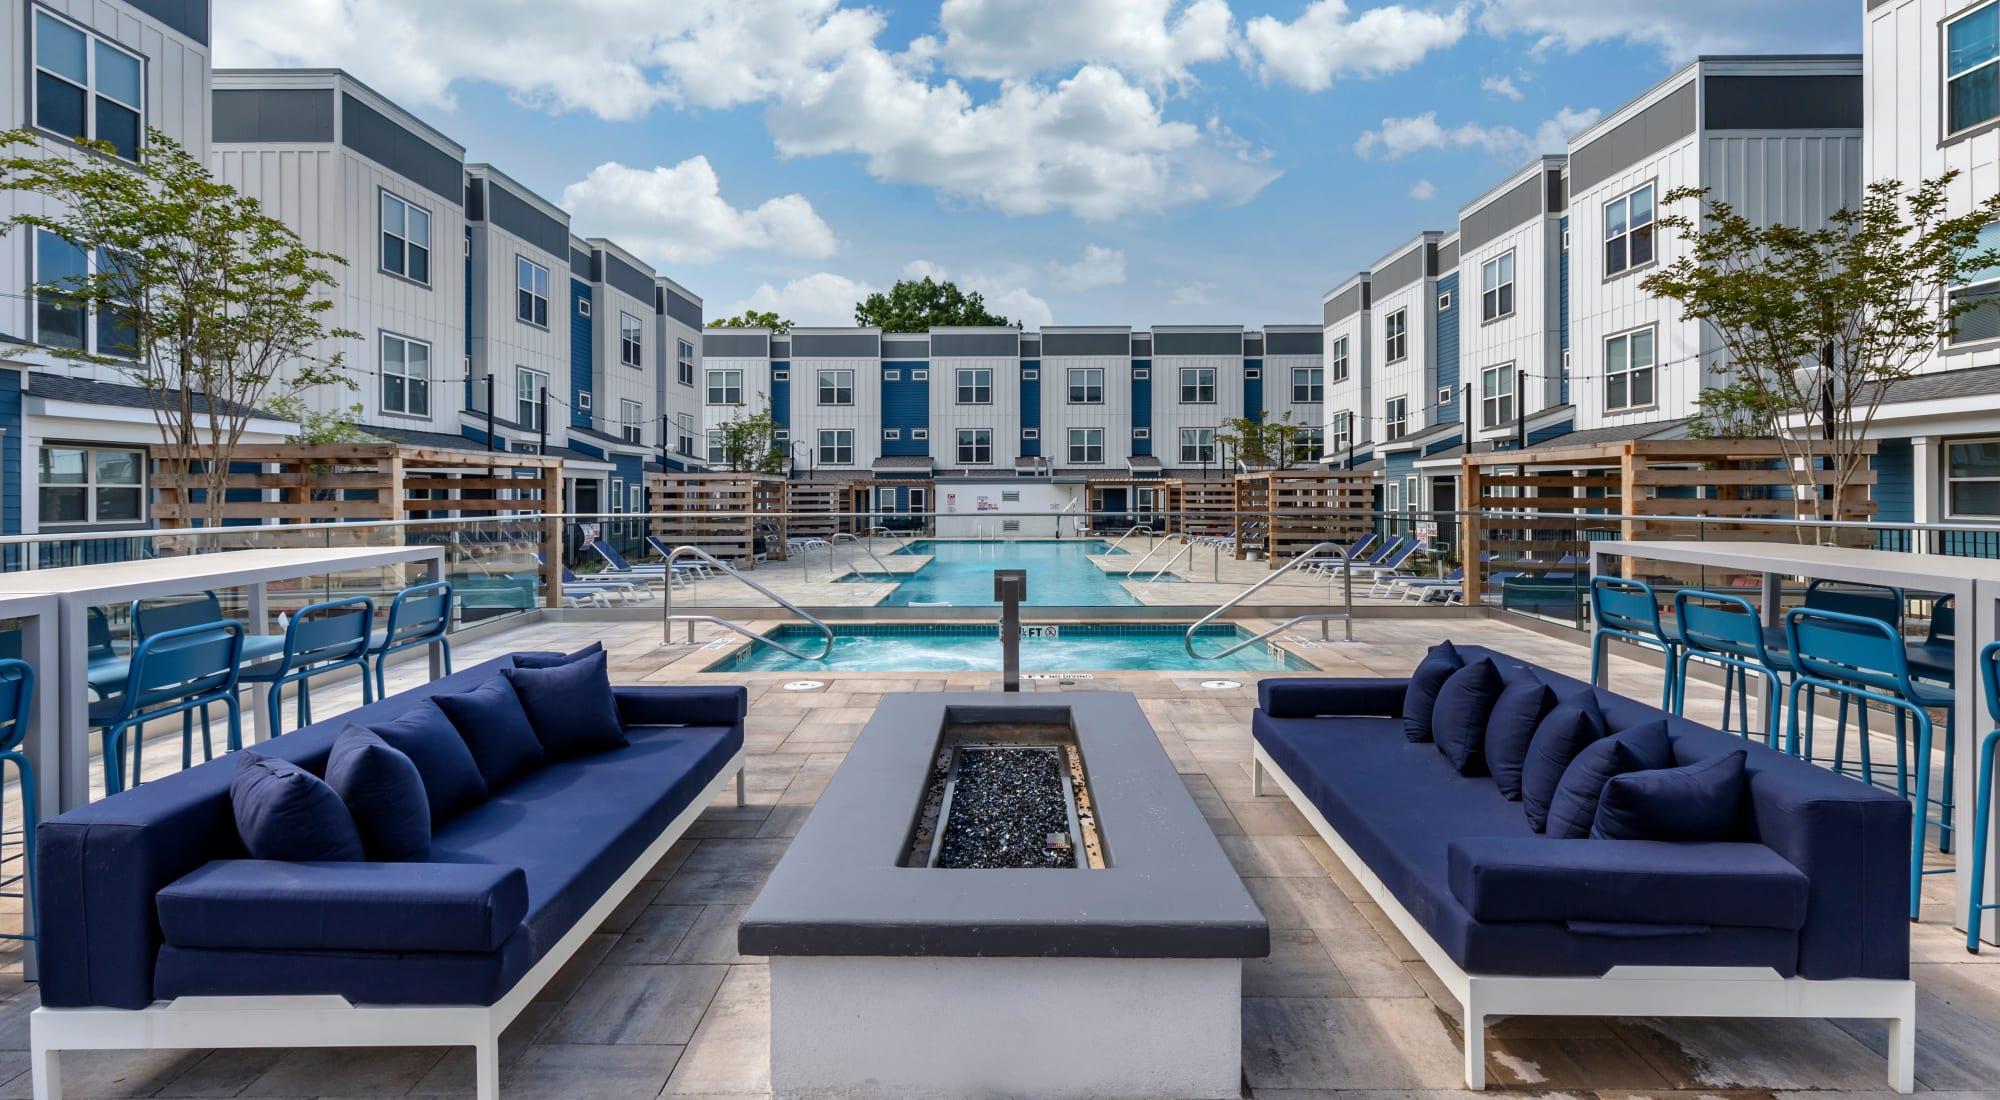 Apartments at LATITUDE on Hillsborough in Raleigh, North Carolina